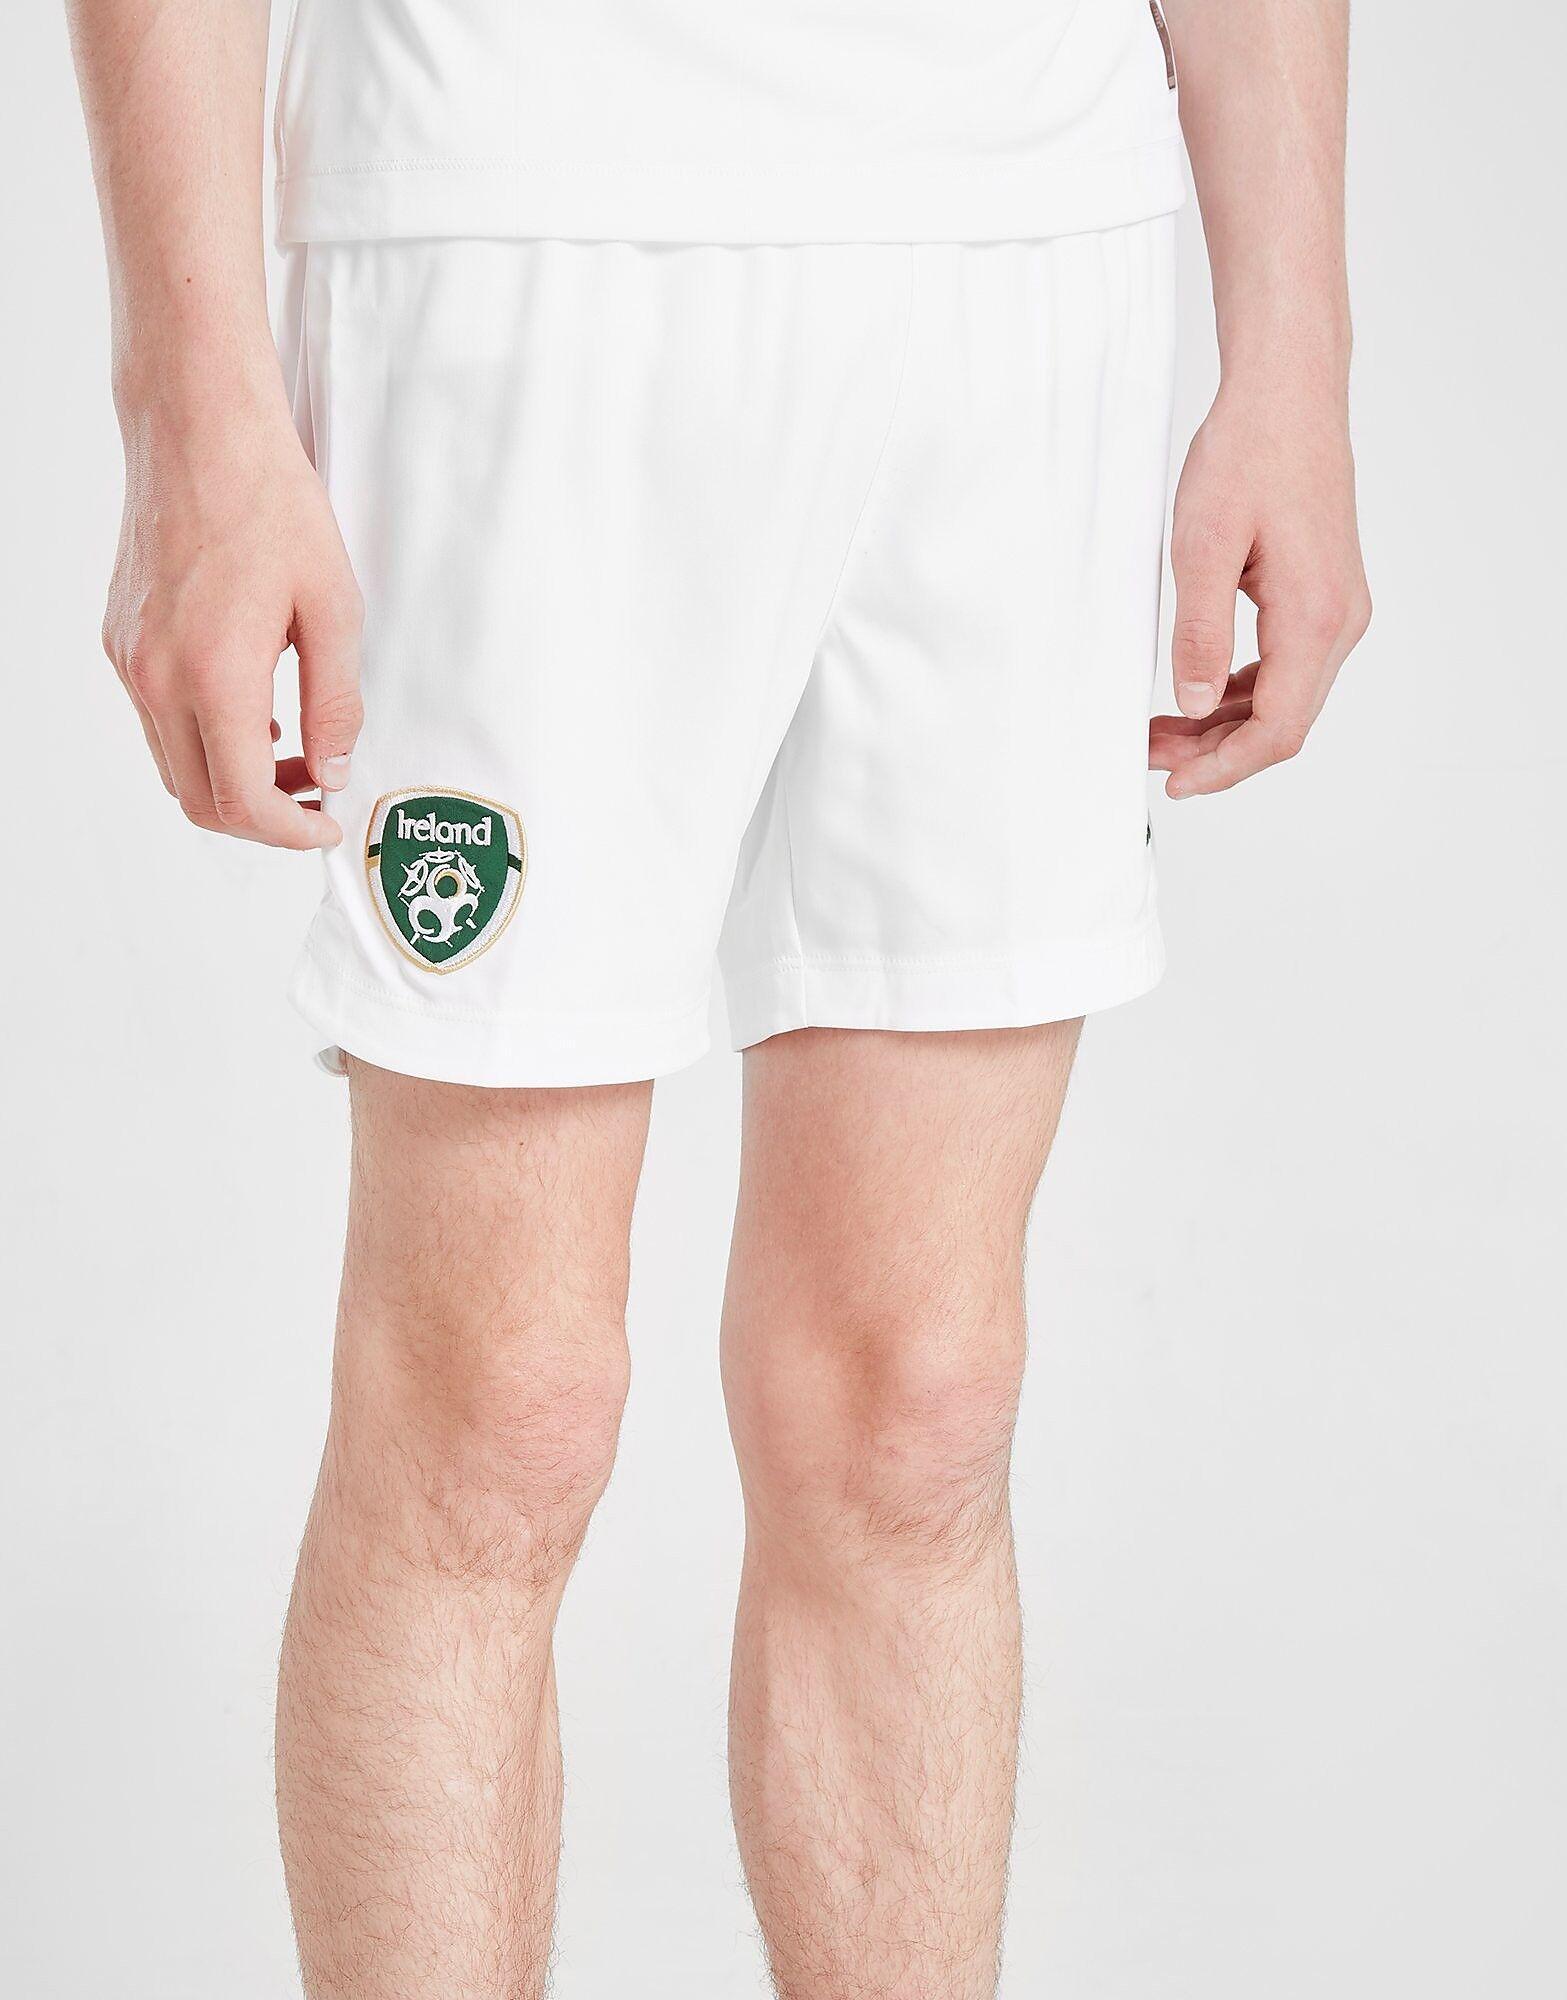 Image of New Balance Republic of Ireland 2019/20 Away Shorts Junior - Kids, Valkoinen